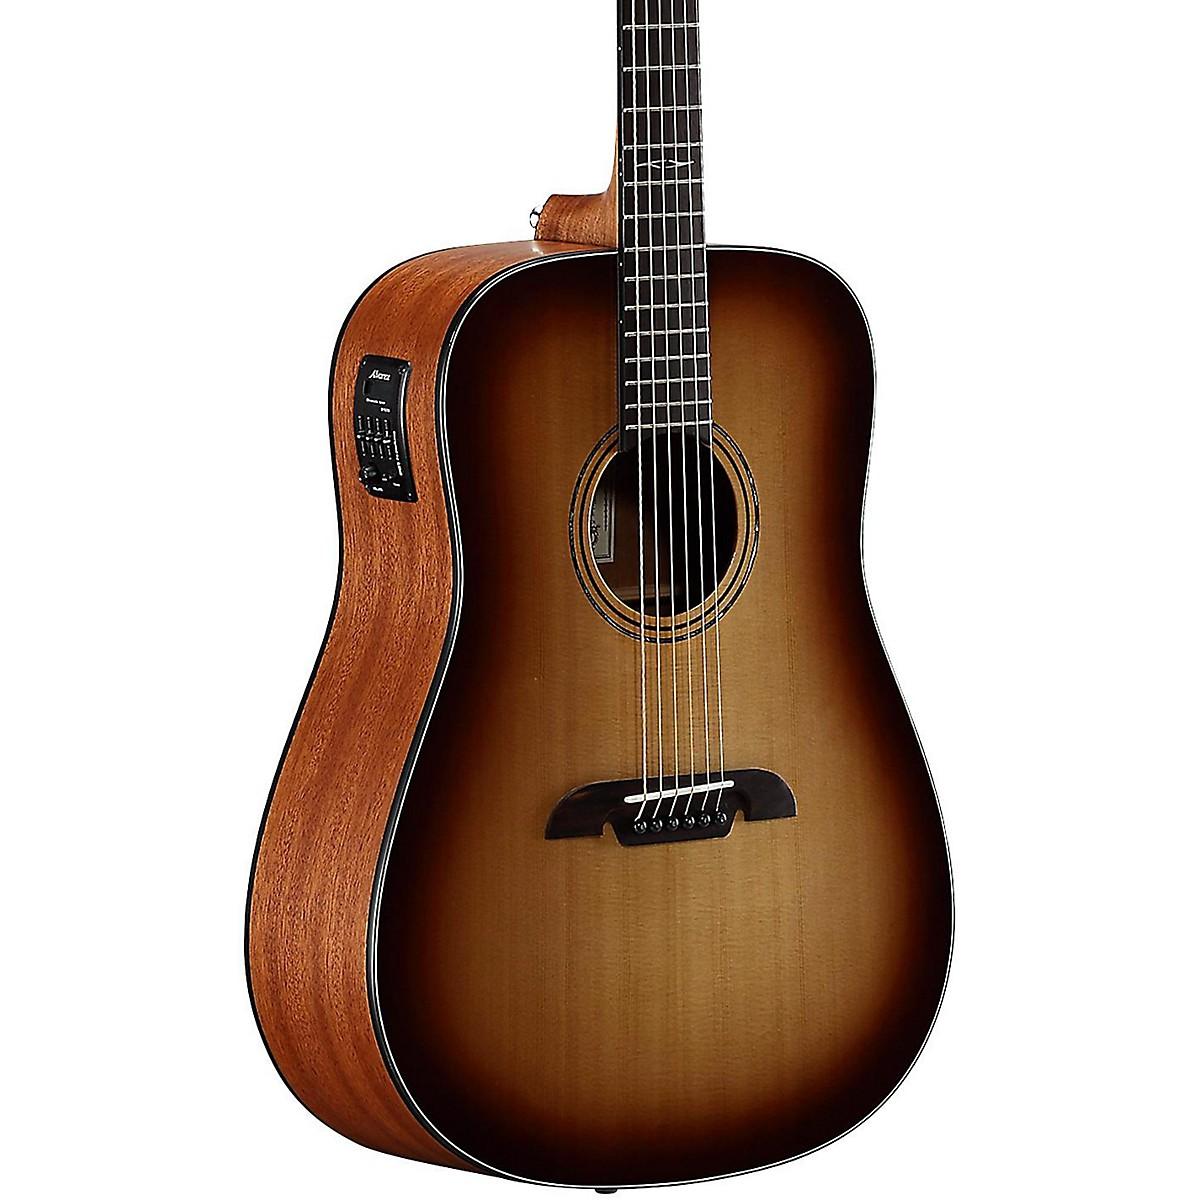 Alvarez AD610ESHB Dreadnought Acoustic-Electric Guitar